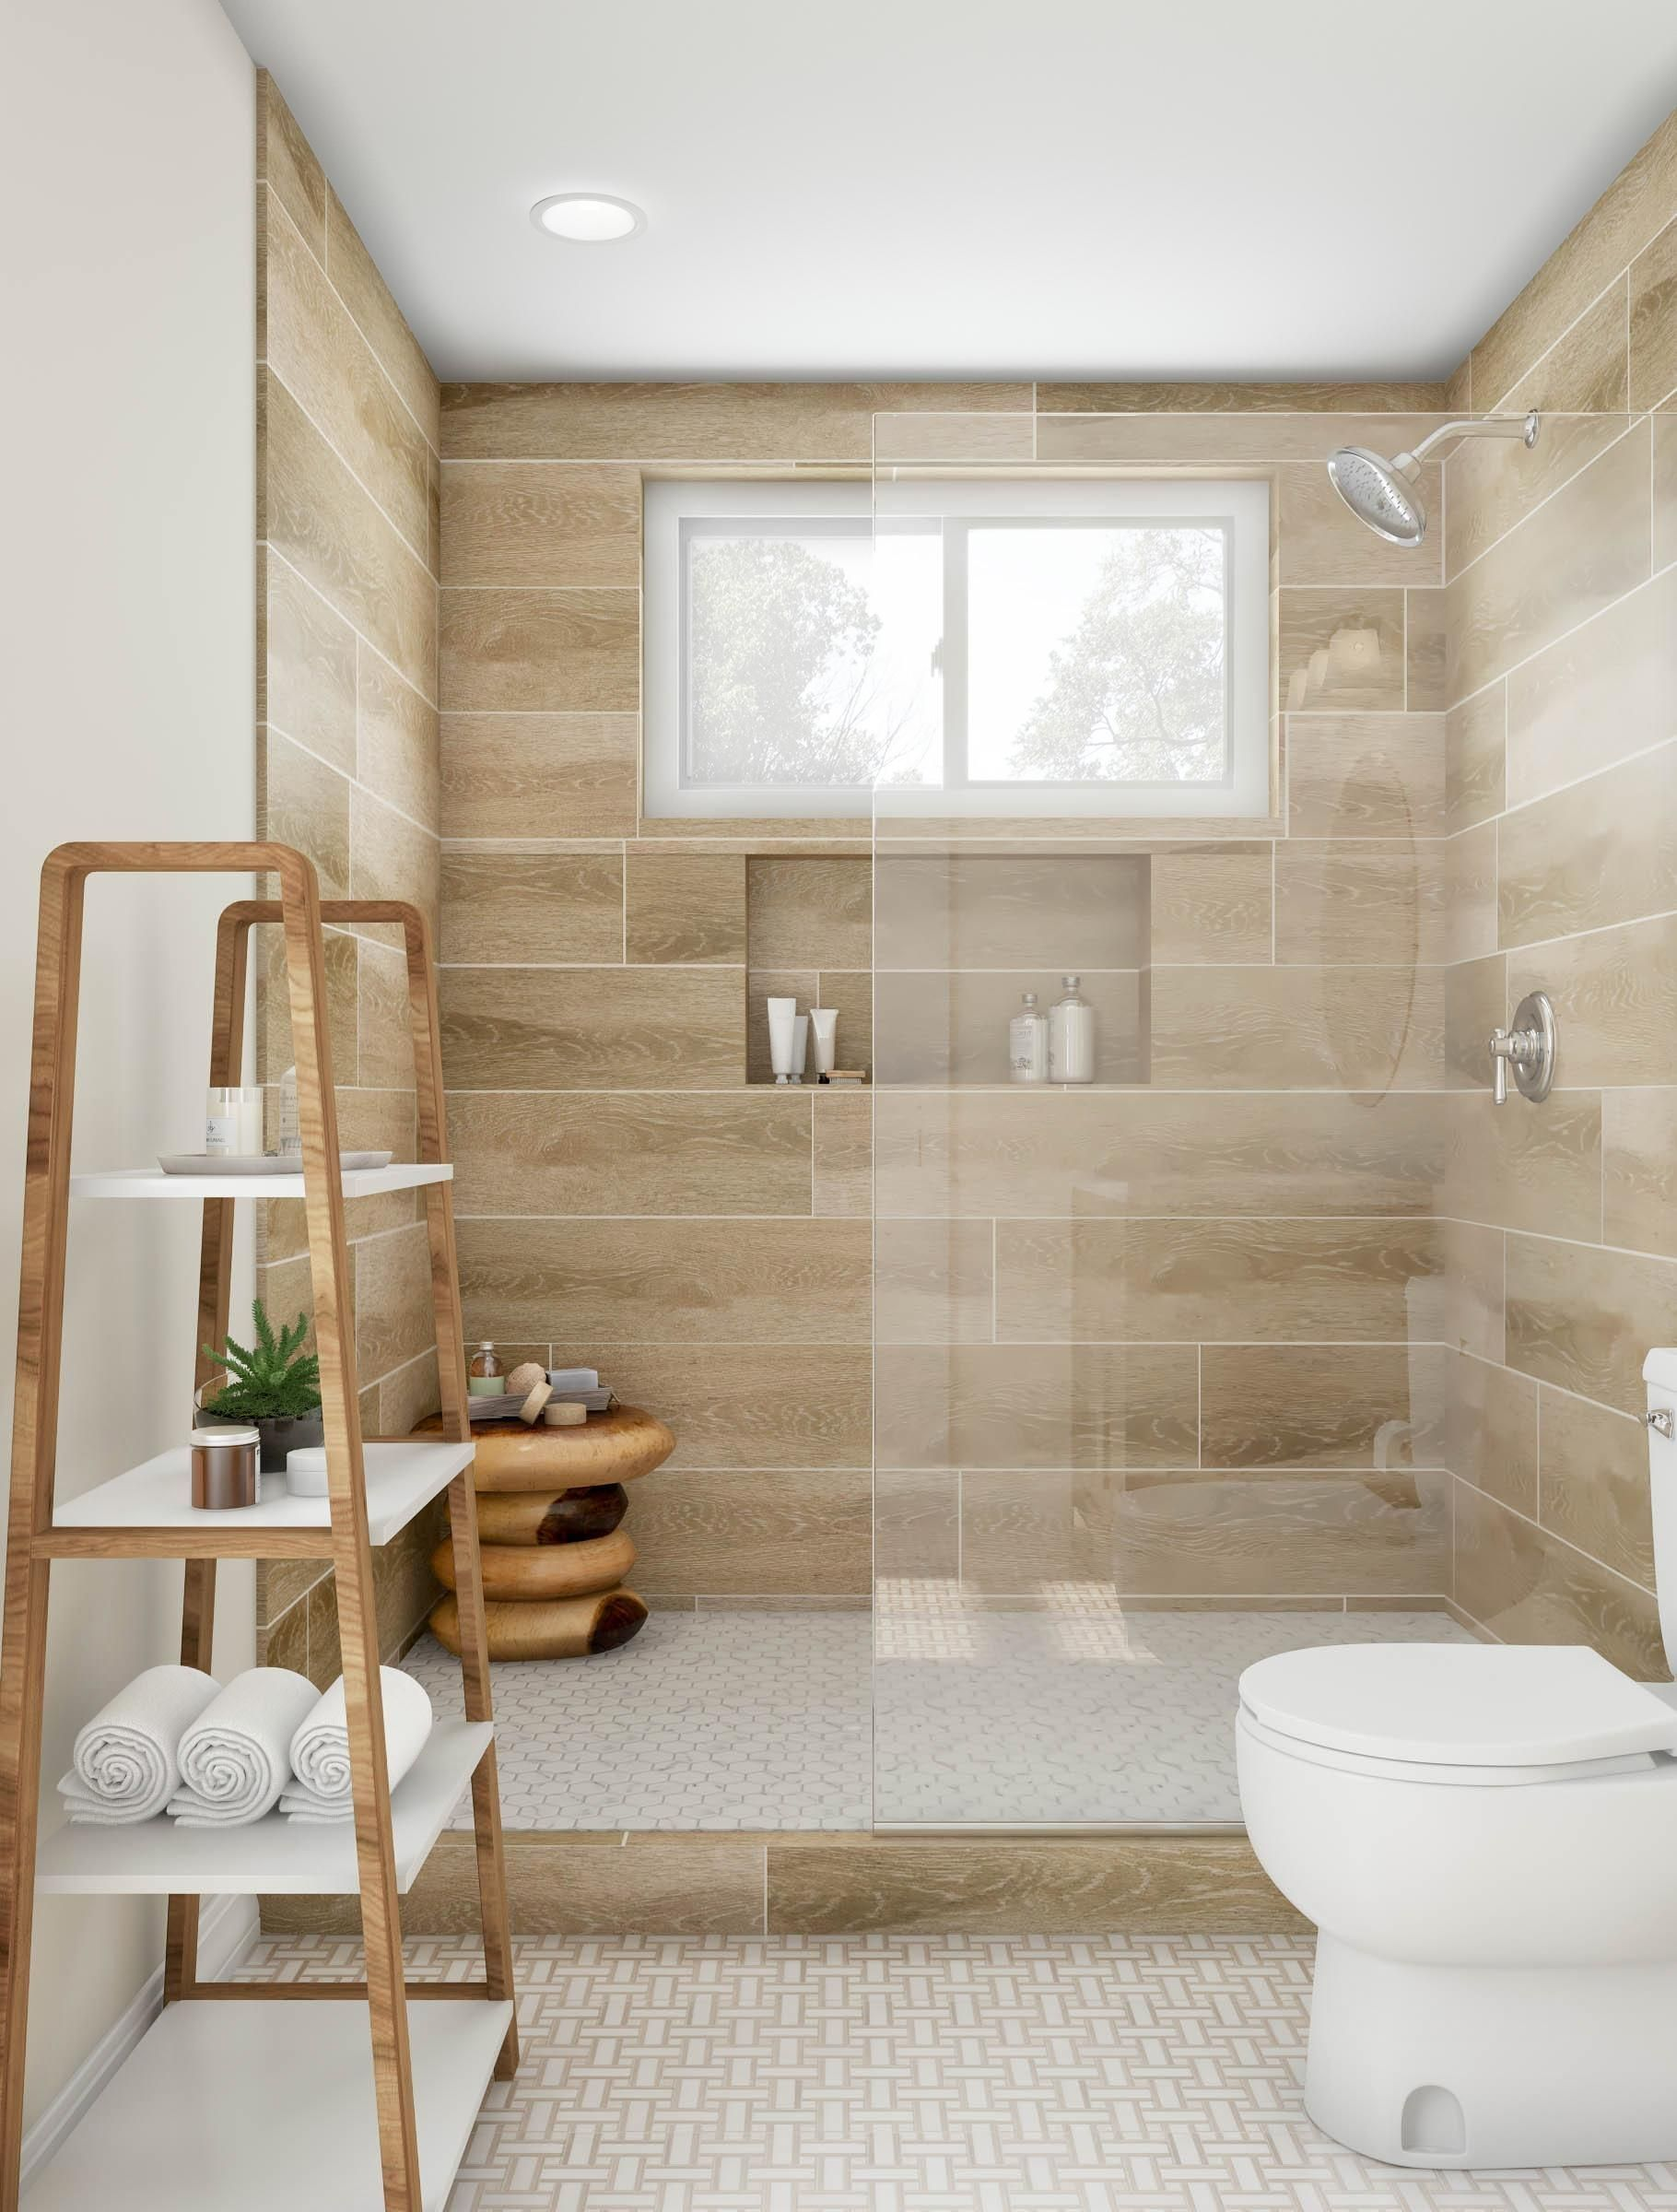 49 Clever Small Bathroom Decorating Ideas Bathroom Design Small